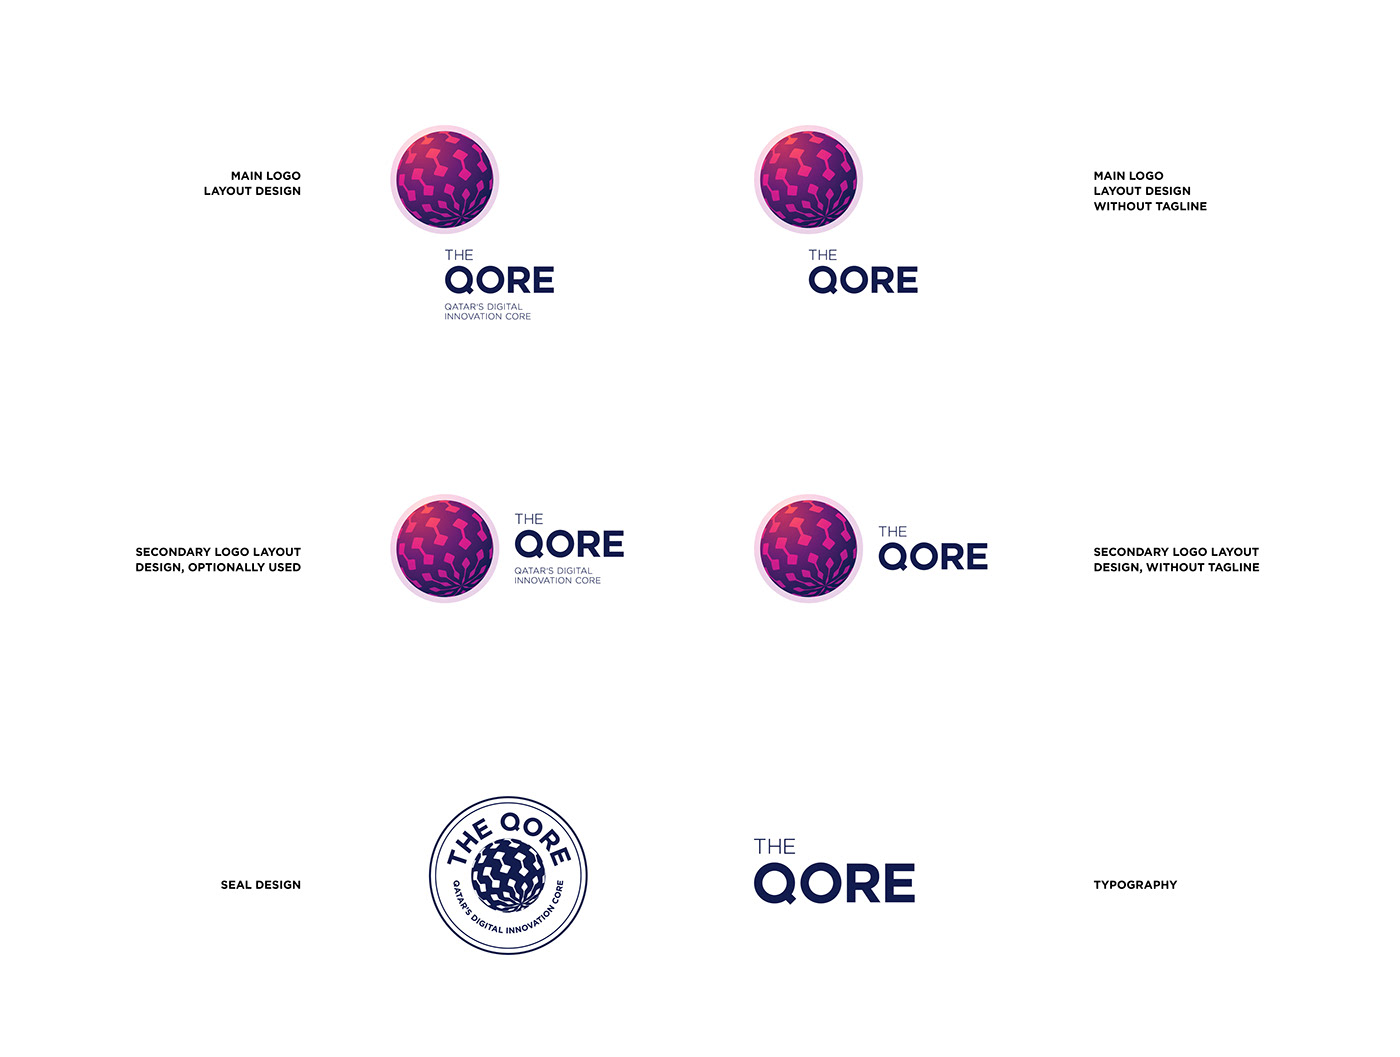 core Qore Qatar center Technology Hub innovation venture Startup research